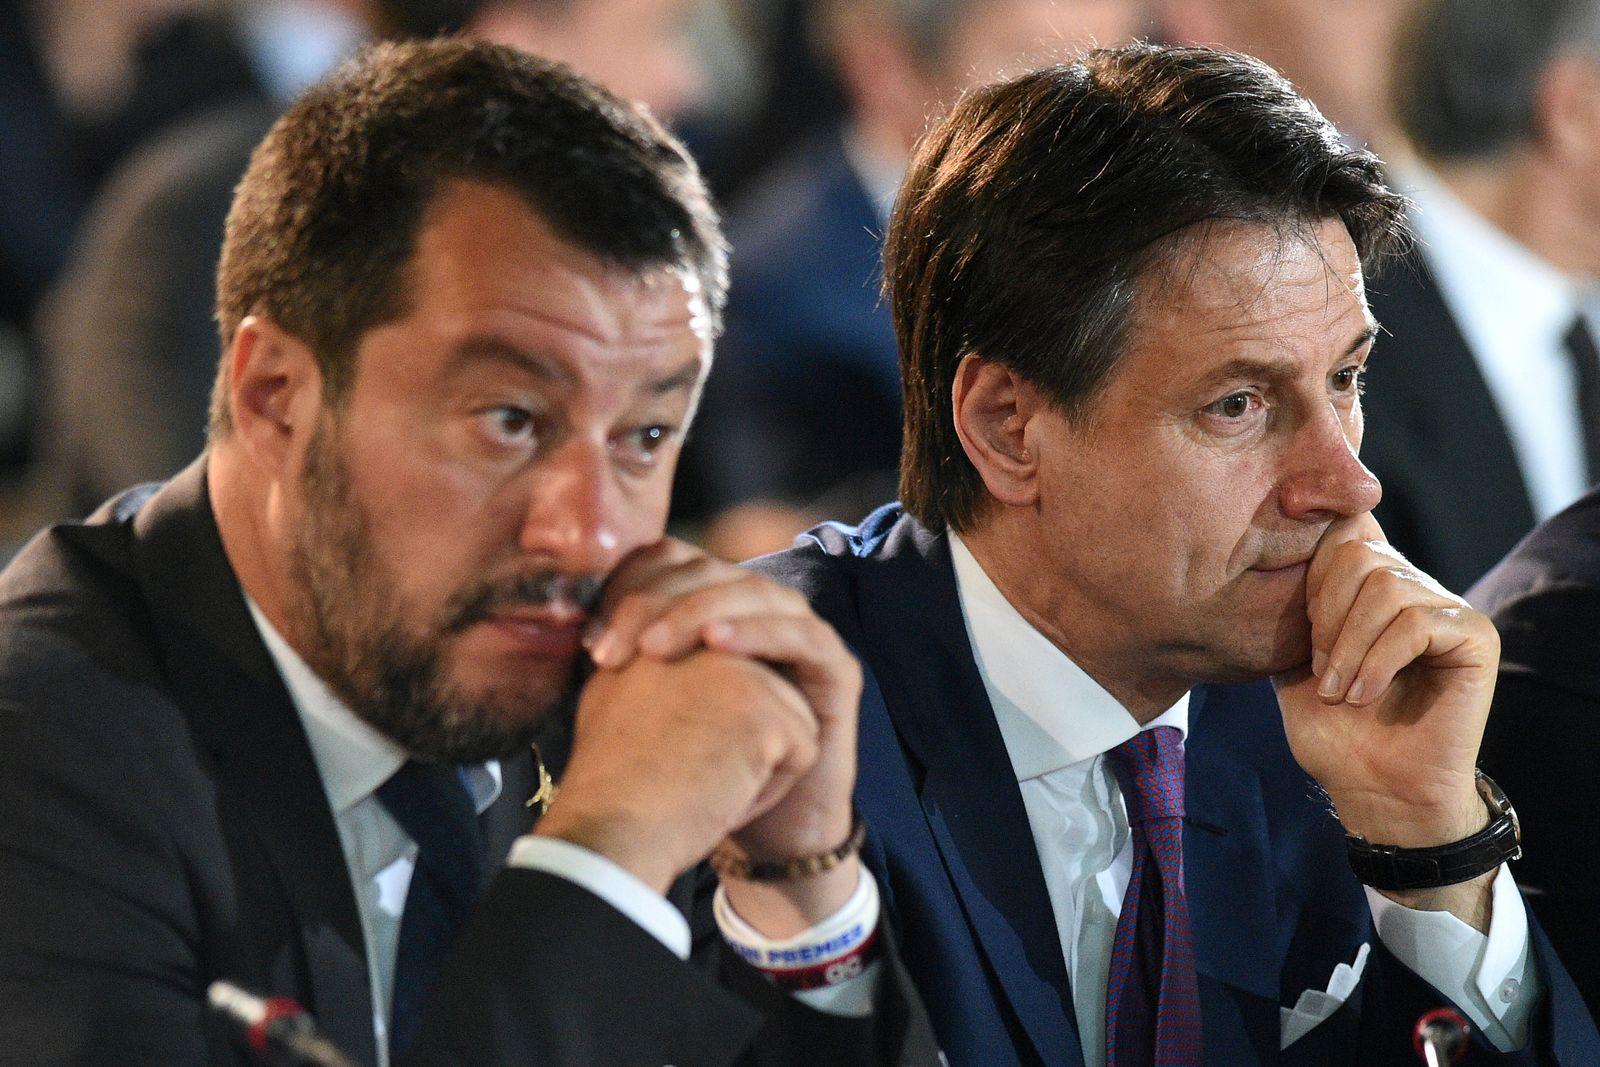 ITALY-POLITICS/COMMEMORATION